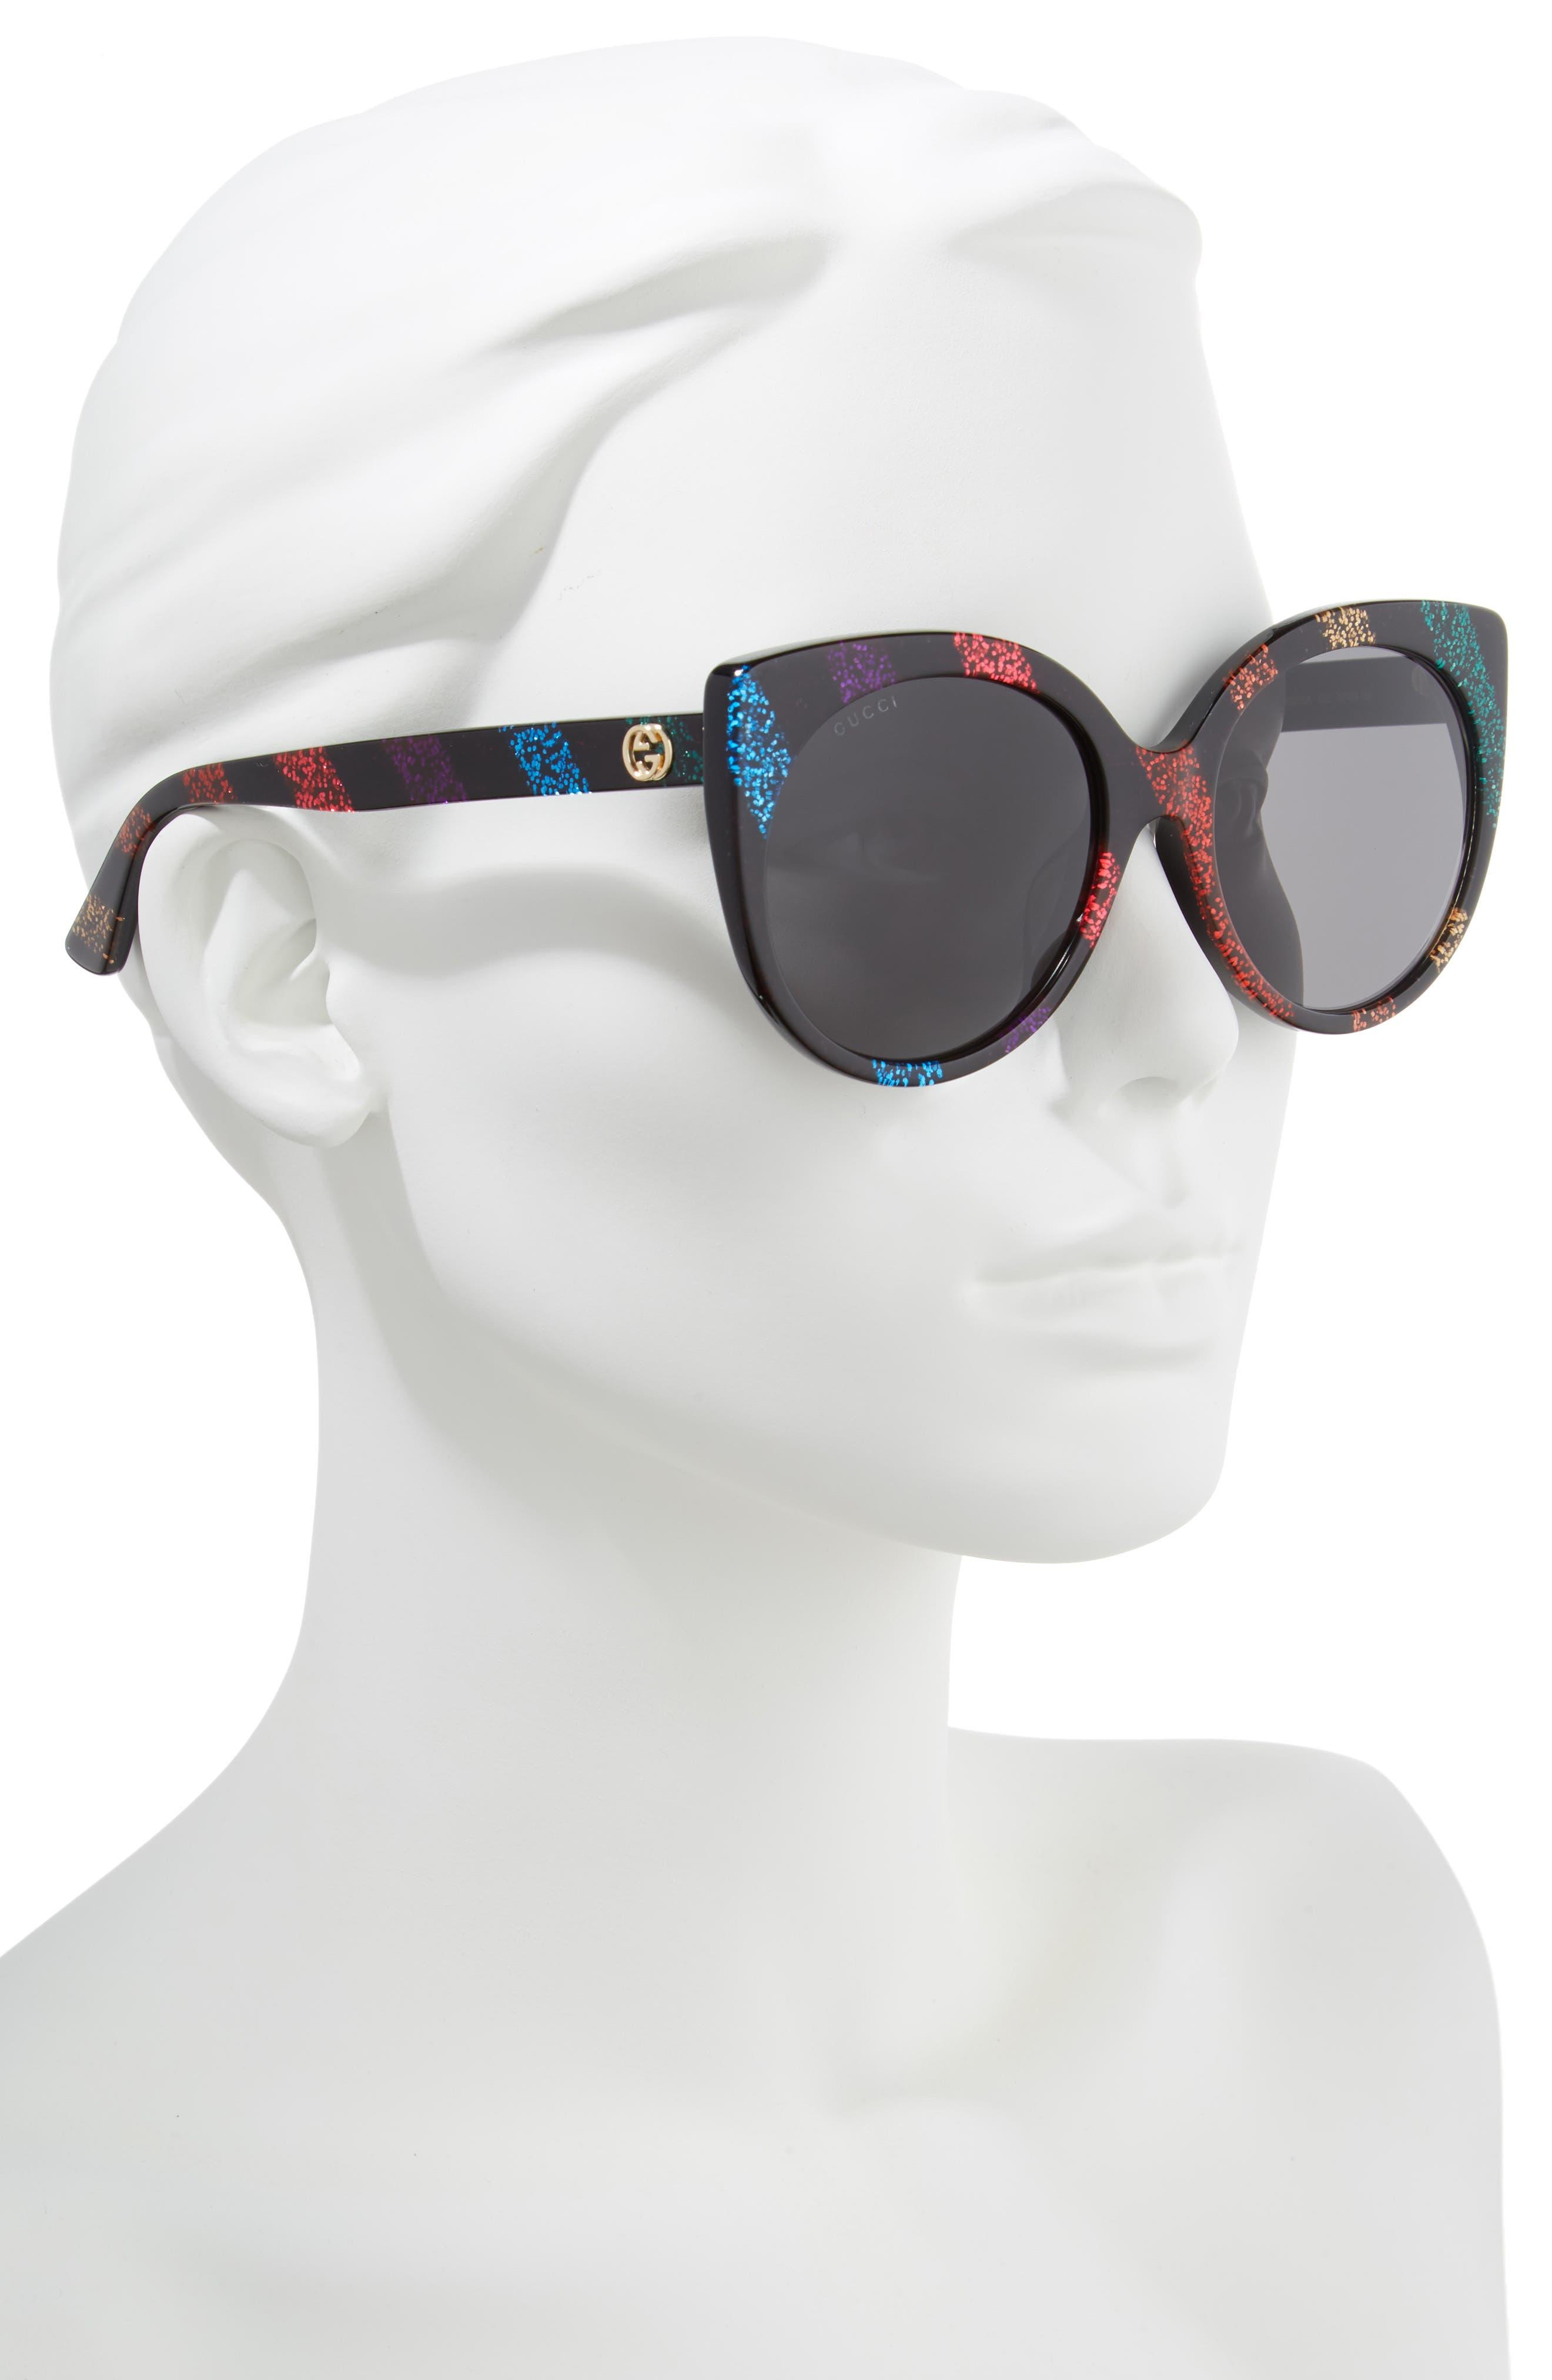 57mm Cat Eye Sunglasses,                             Alternate thumbnail 2, color,                             010